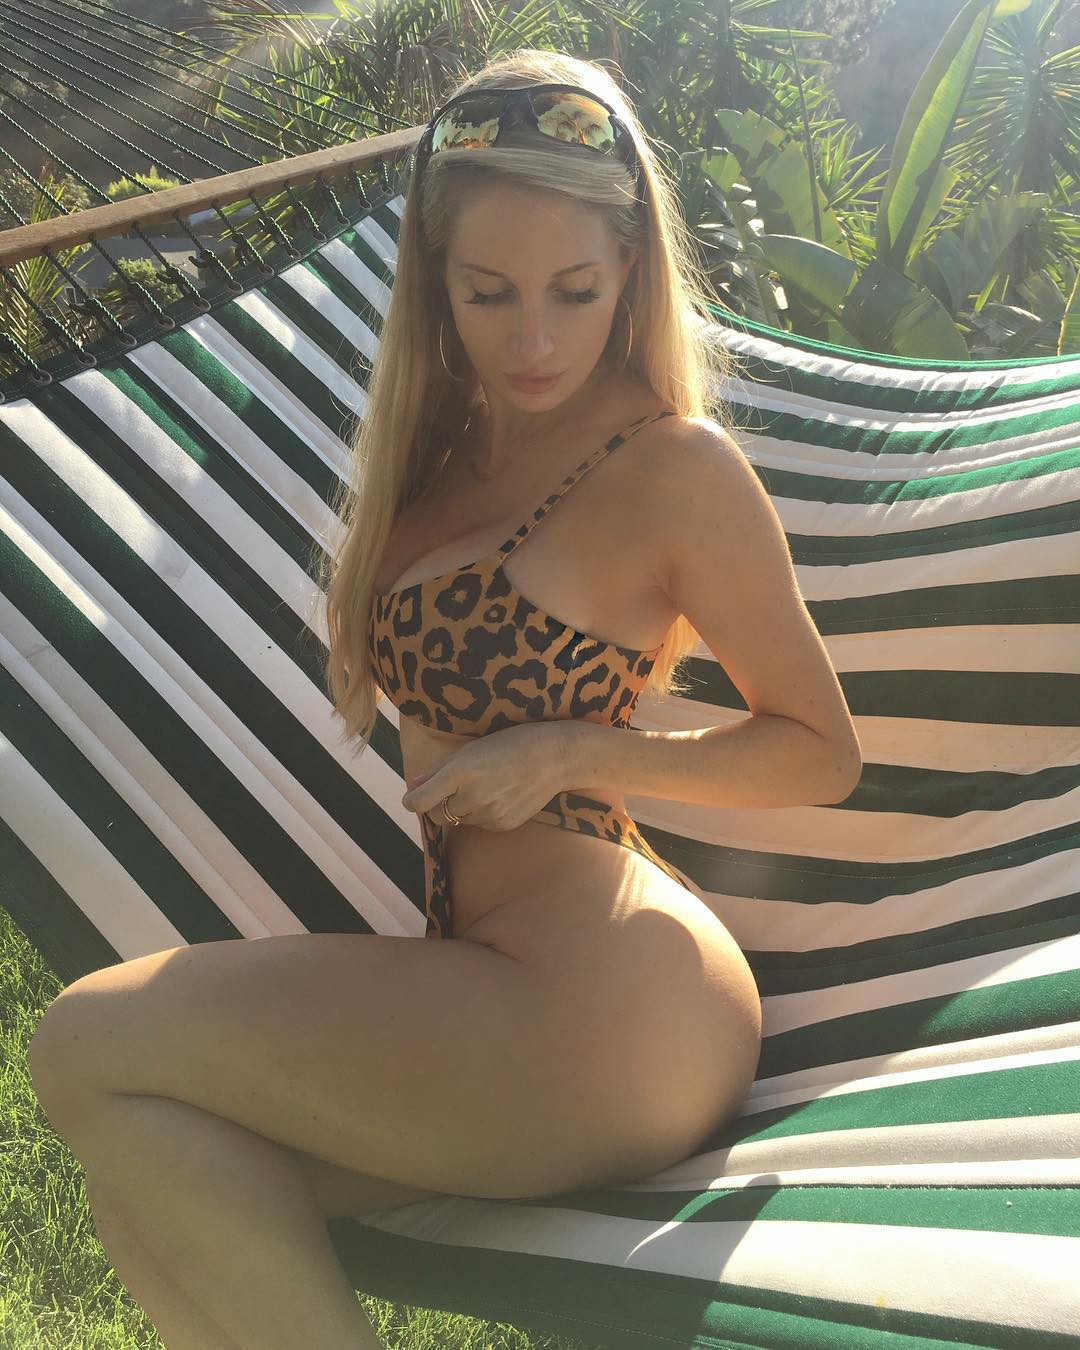 Blonde girls outfit ideas amanda lee reddit, Celebrity sex tape